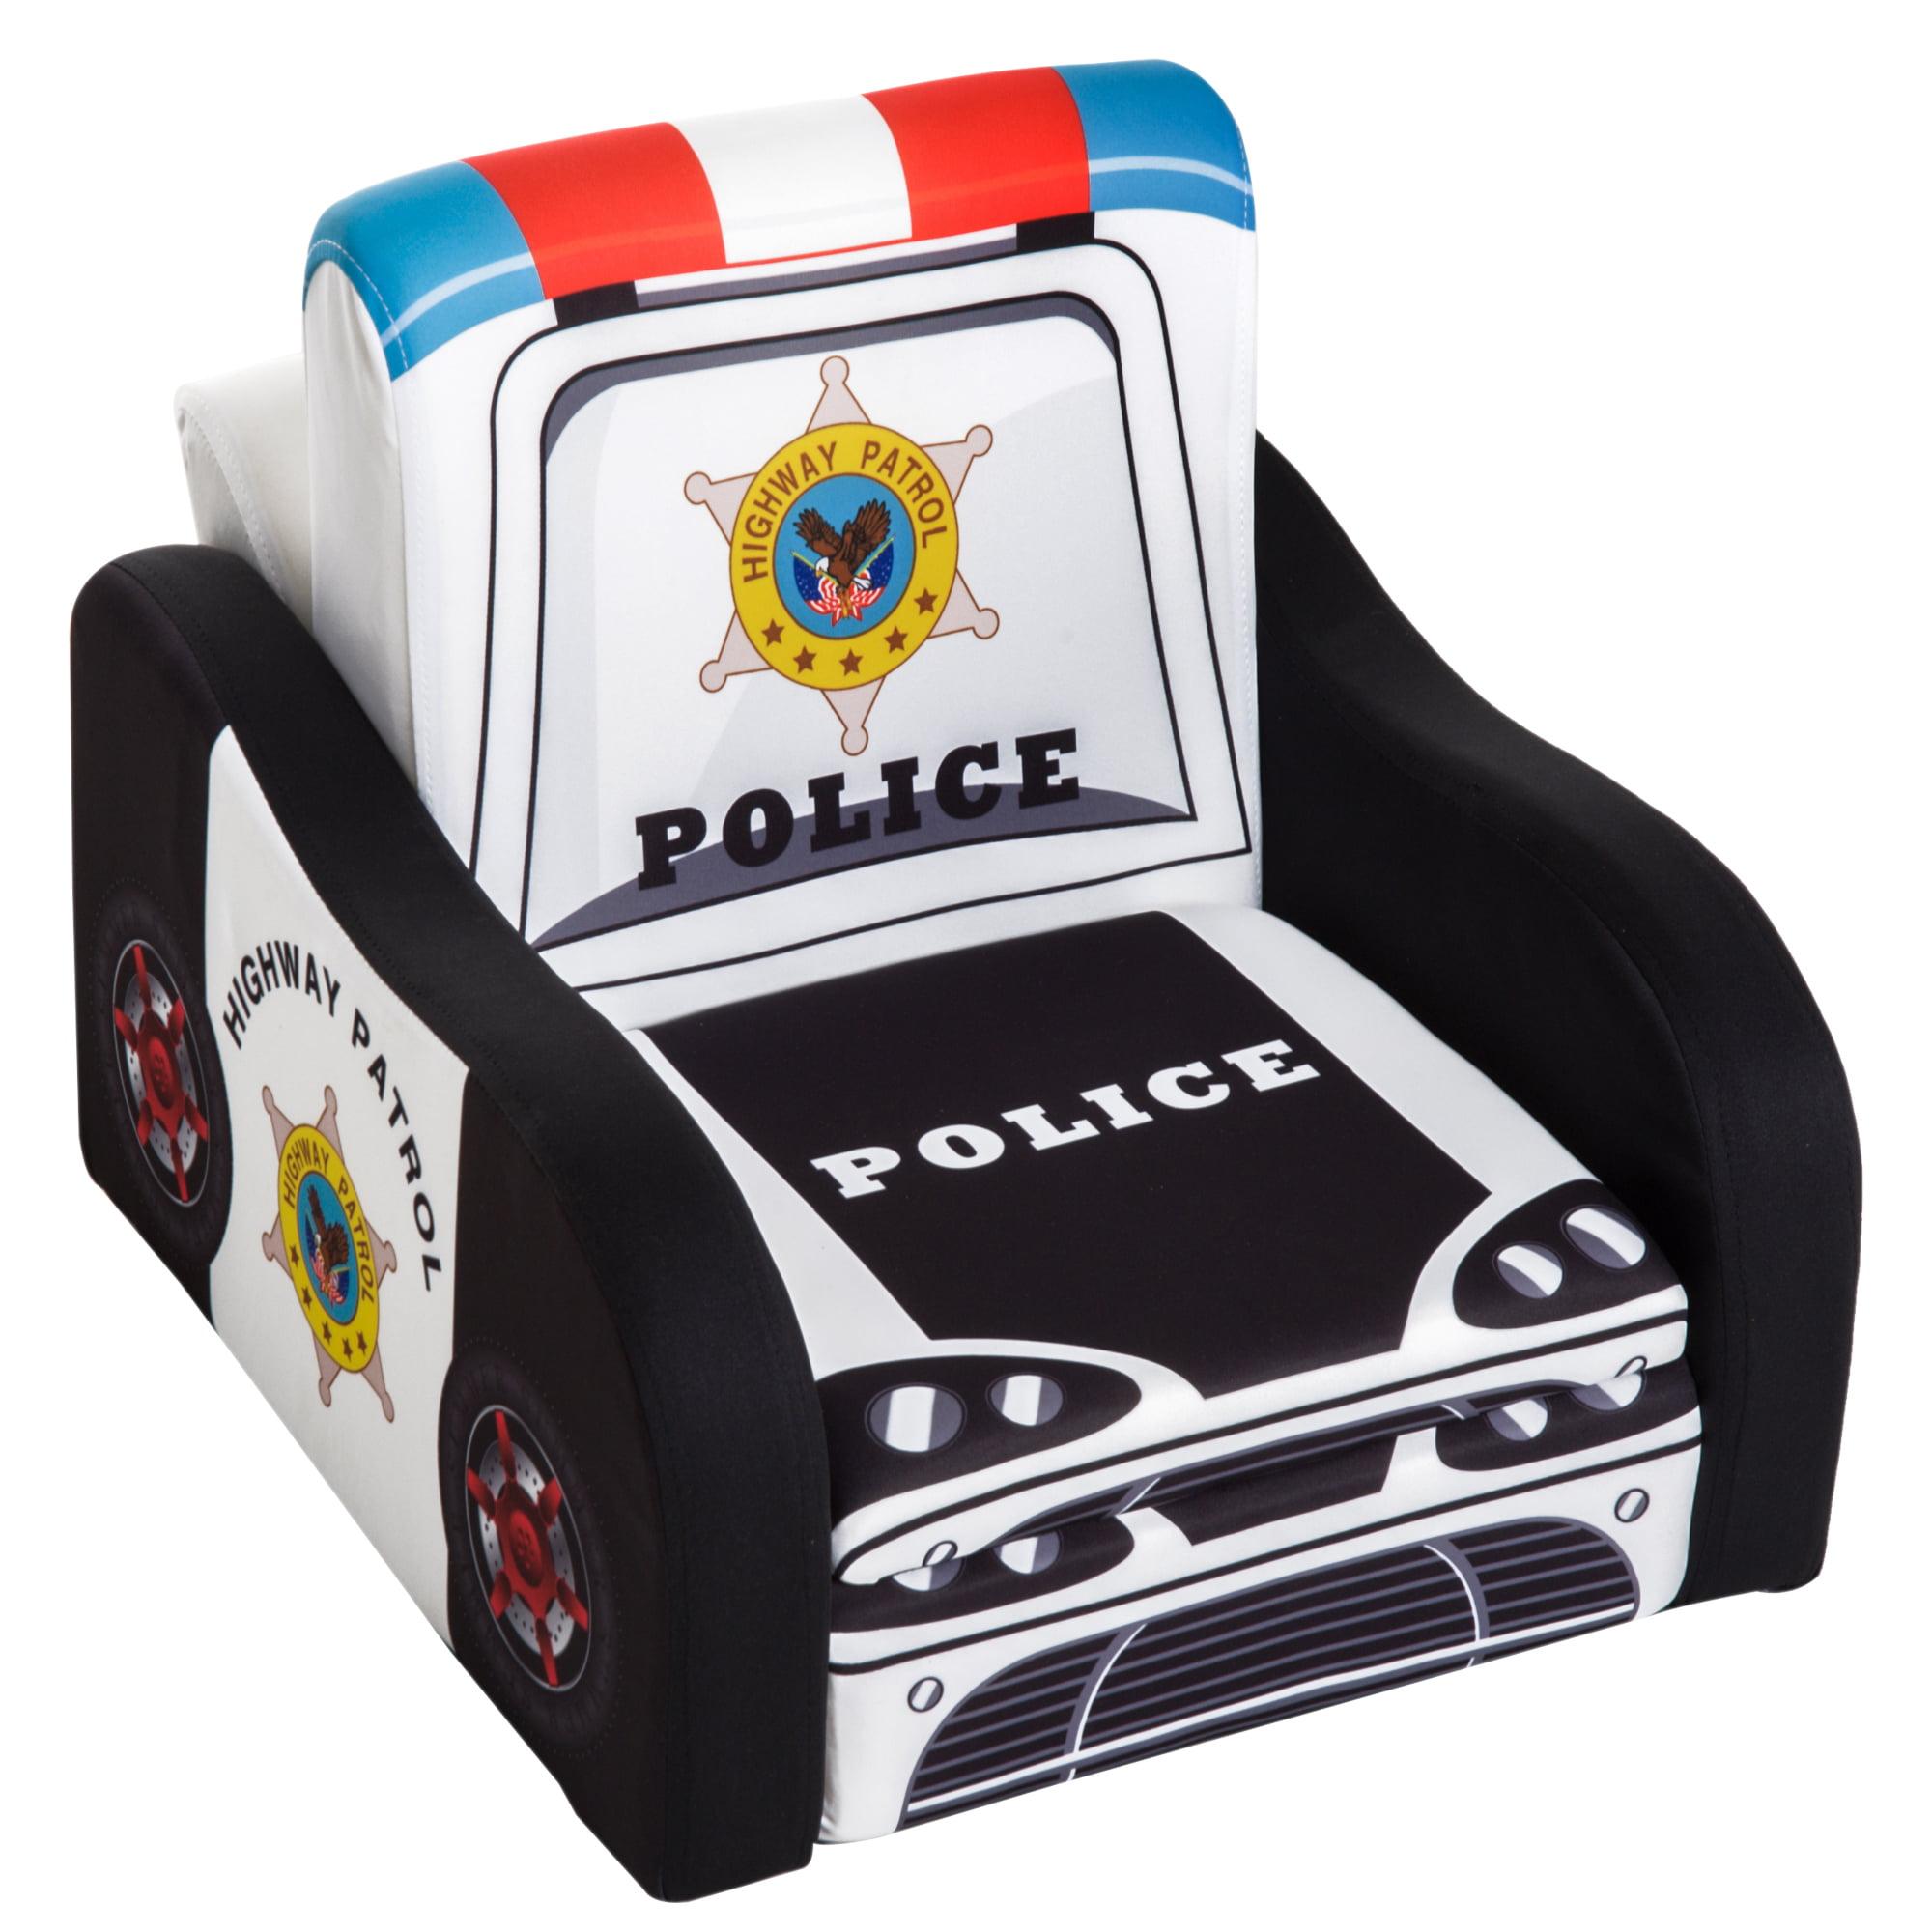 "Qaba 17"" Multi Spandex Storage Sofa Chair for Kids - Police Car"